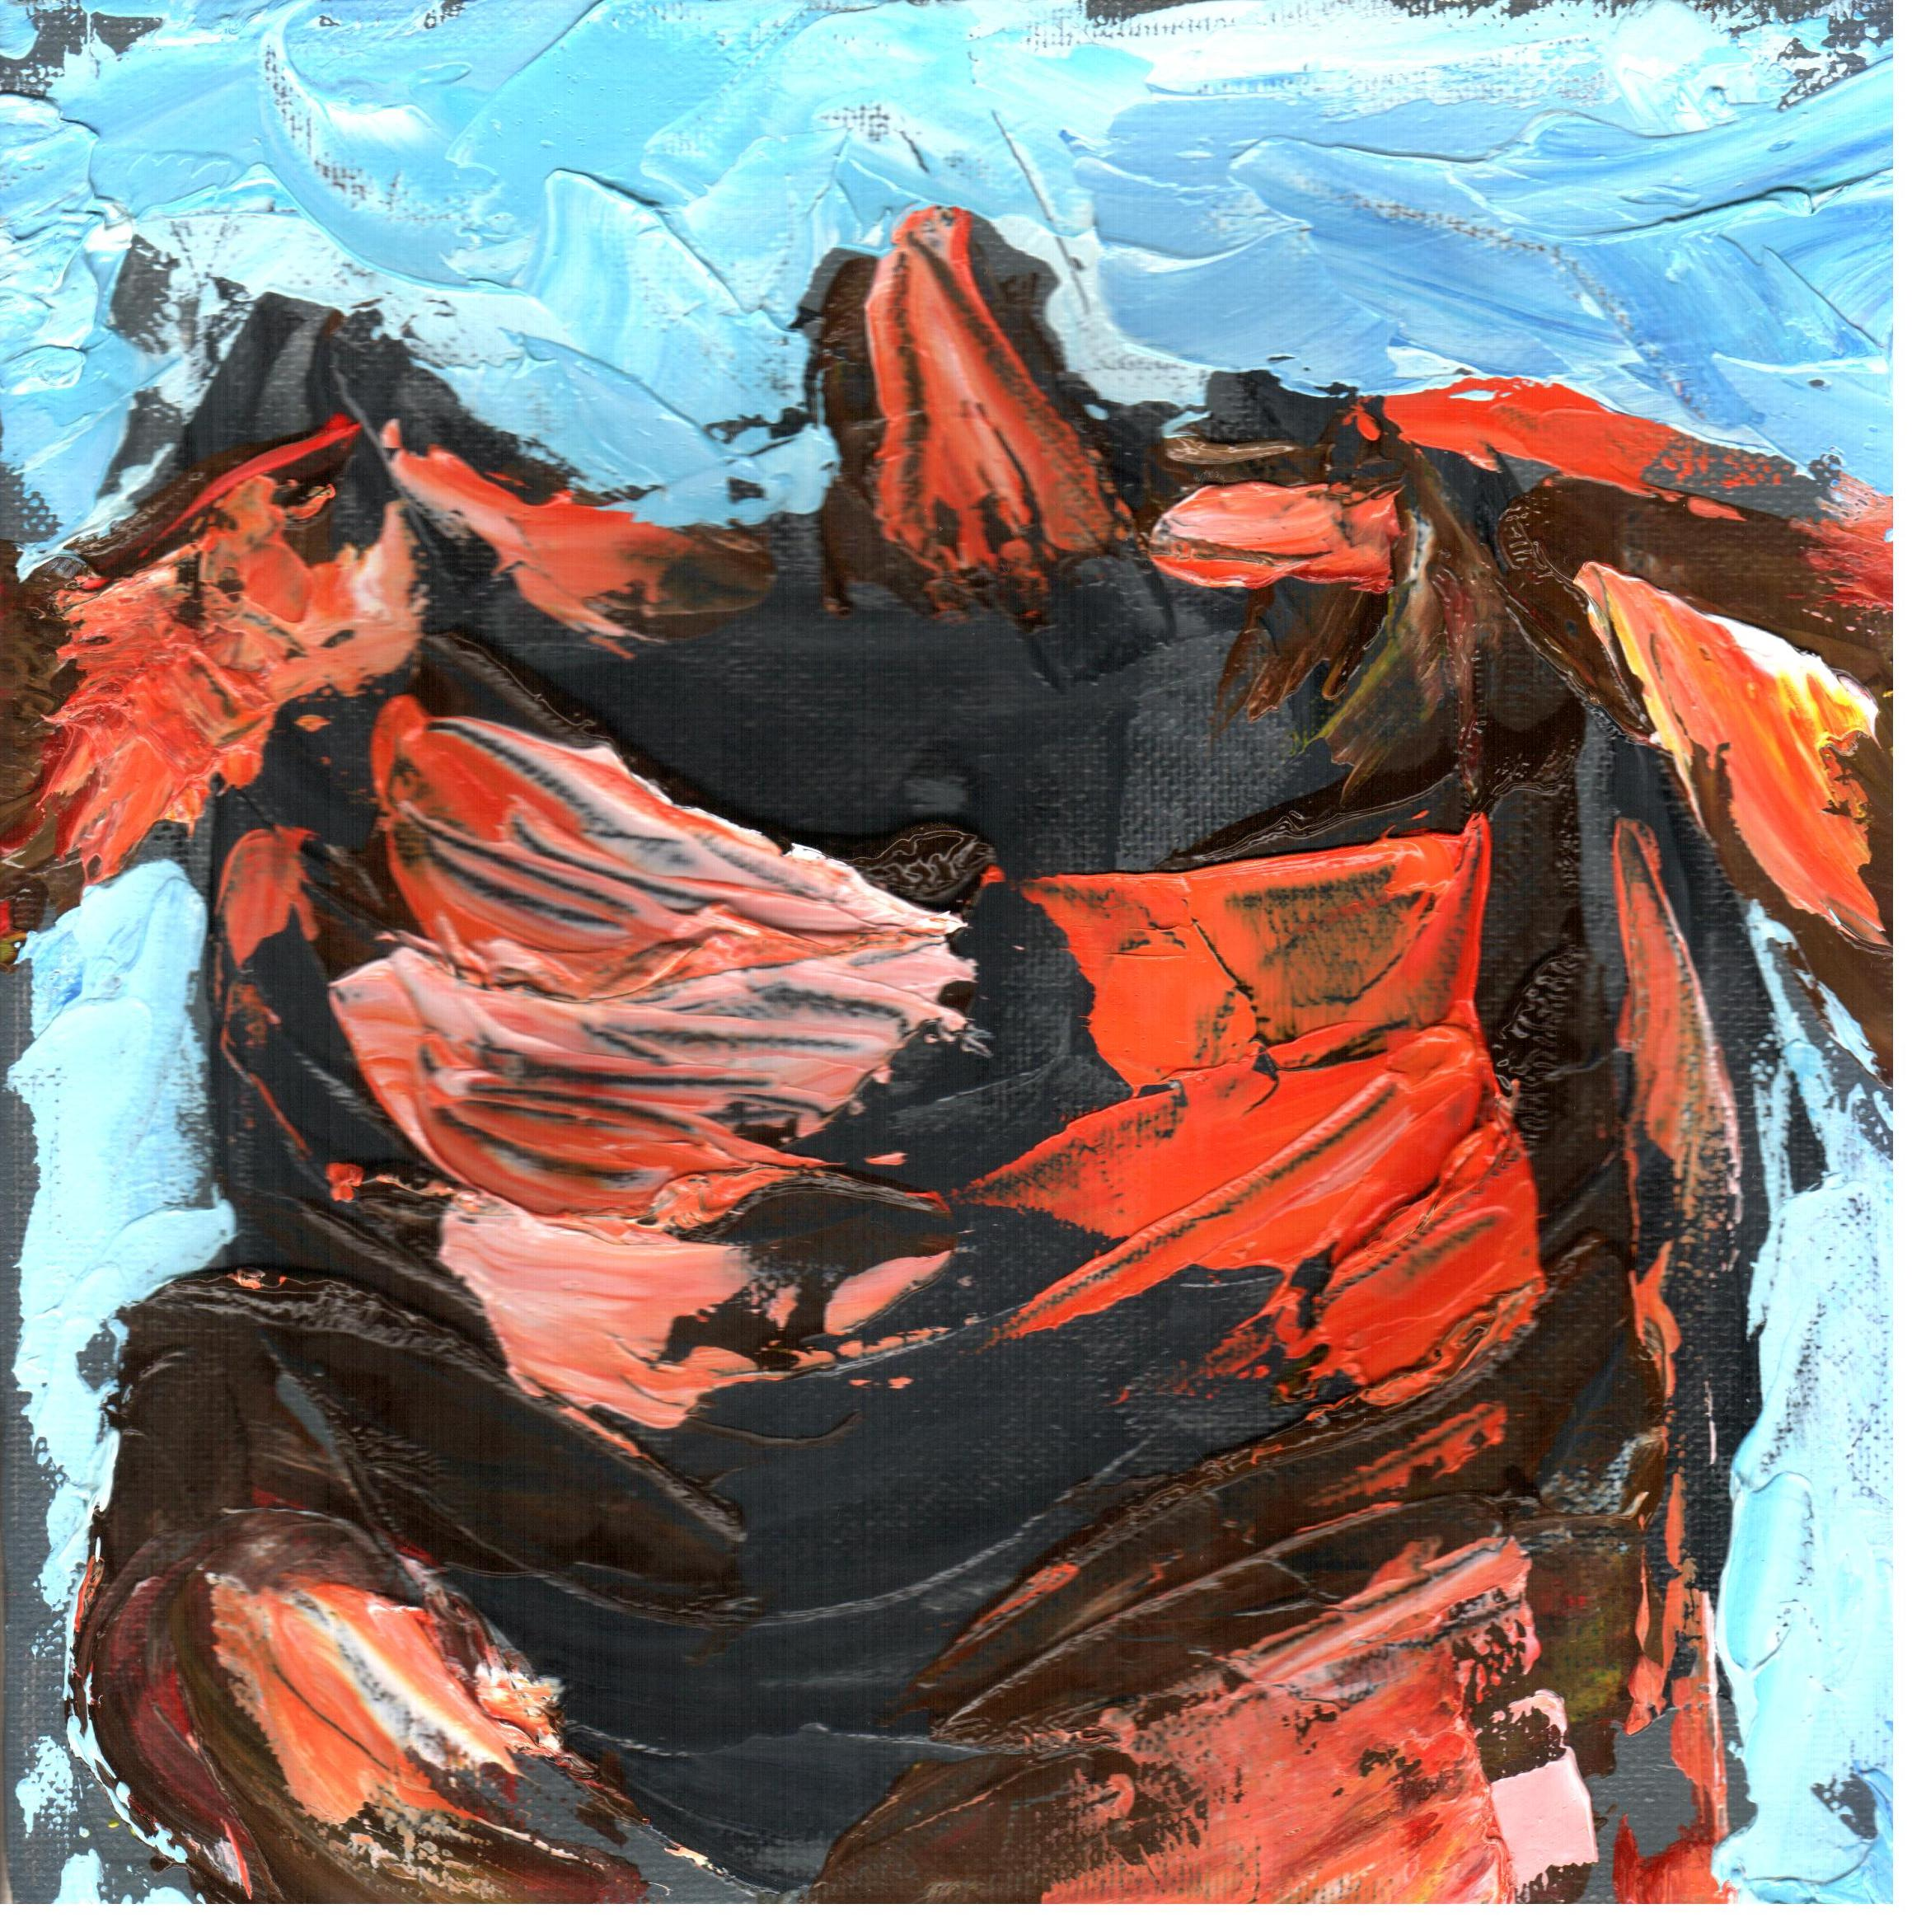 Capriccio informale (whim informal), 2015 dipinto olio su tela (painting-oil on canvas) cm 20x20, Pasquale Mastrogiacomo, Acerno (SA).